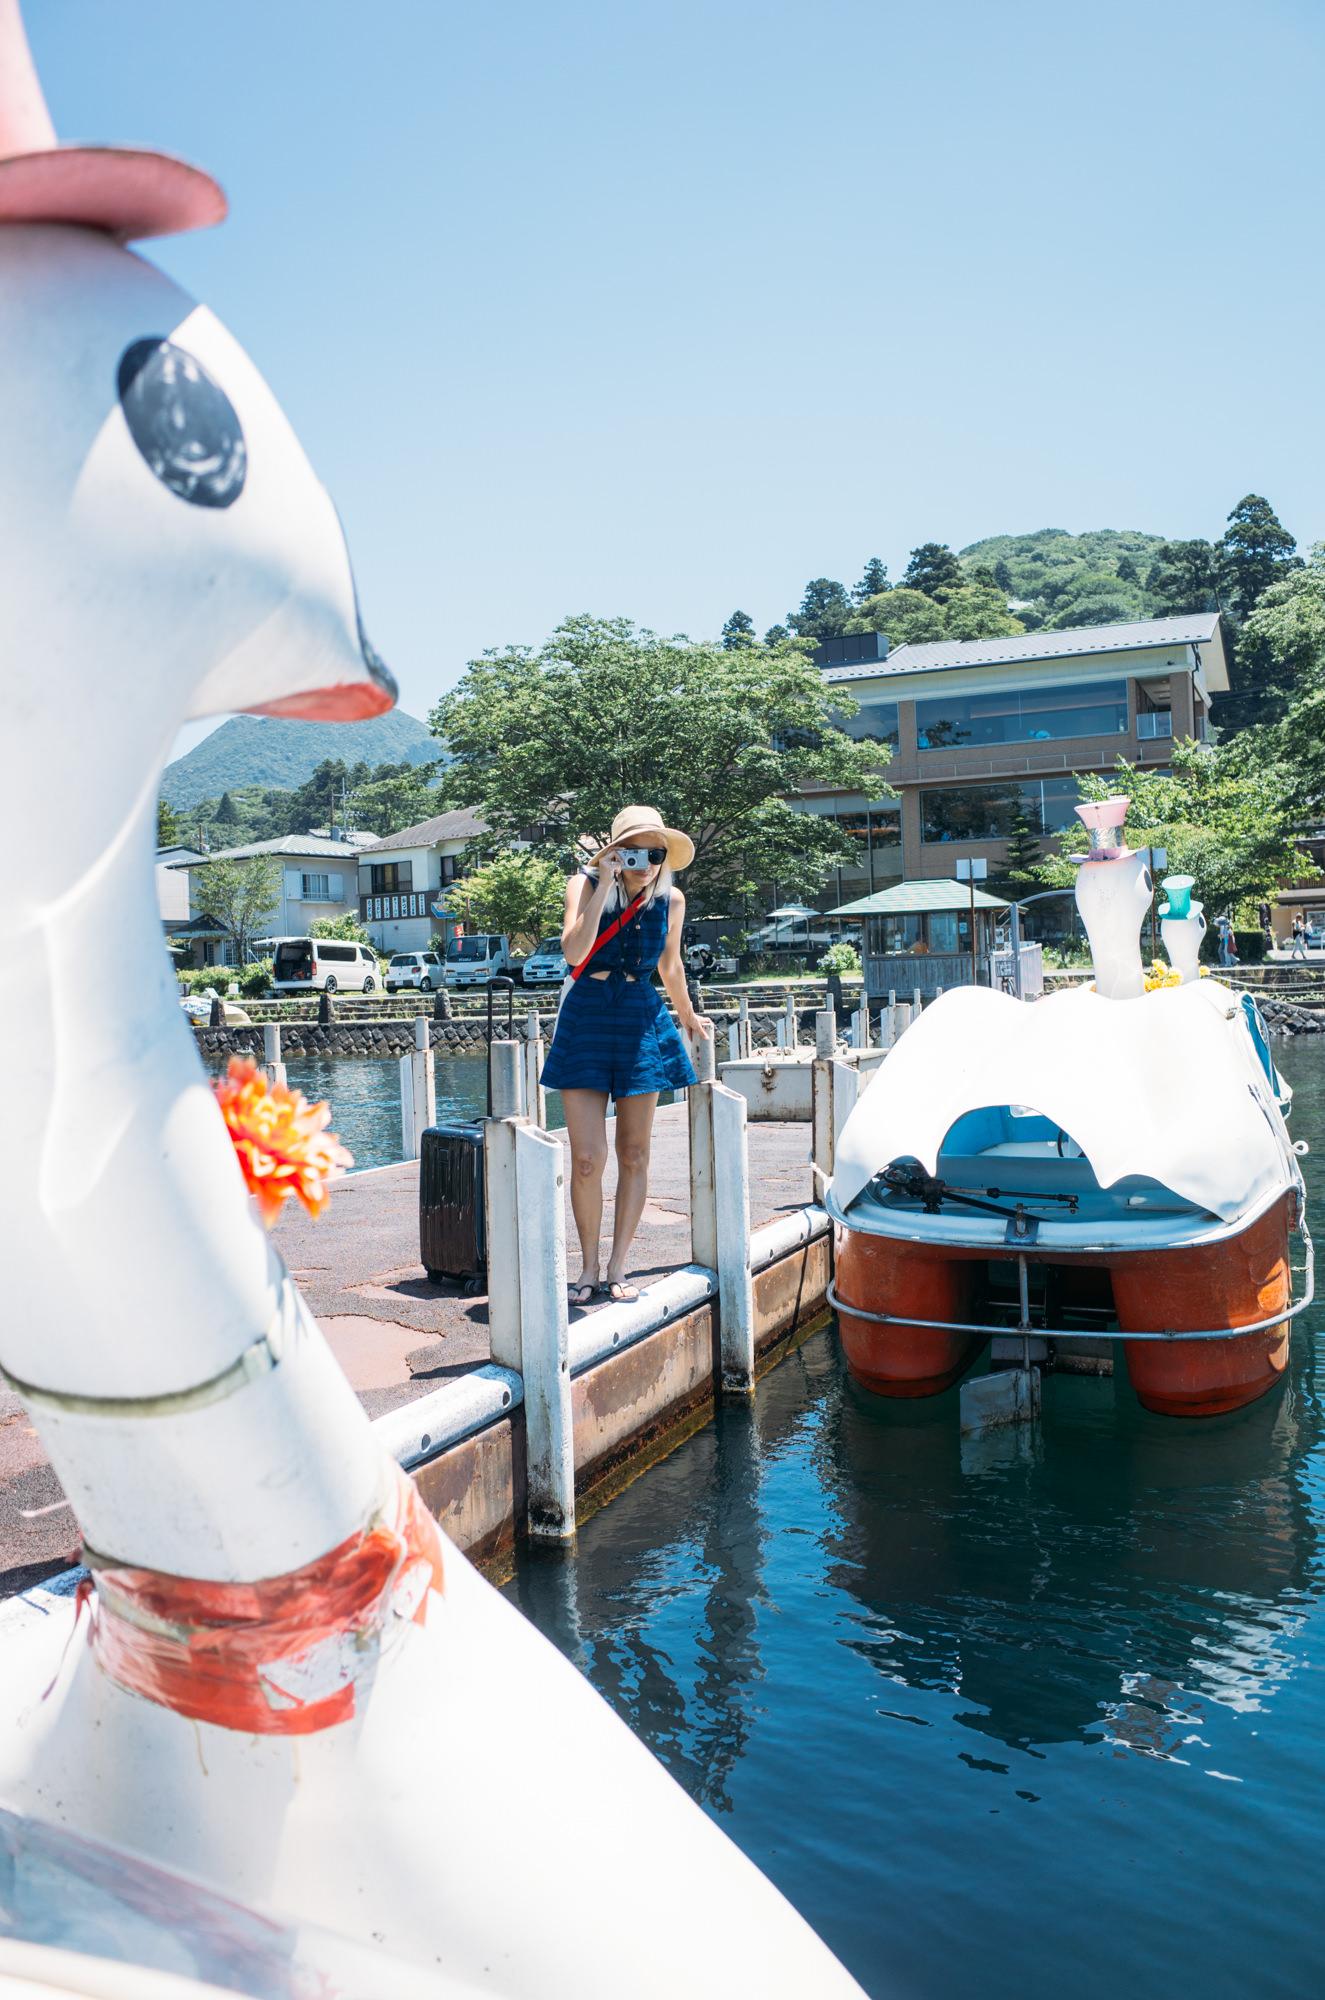 wrenee-hakone-japan-lake-ashi-swan-boats-15.jpg